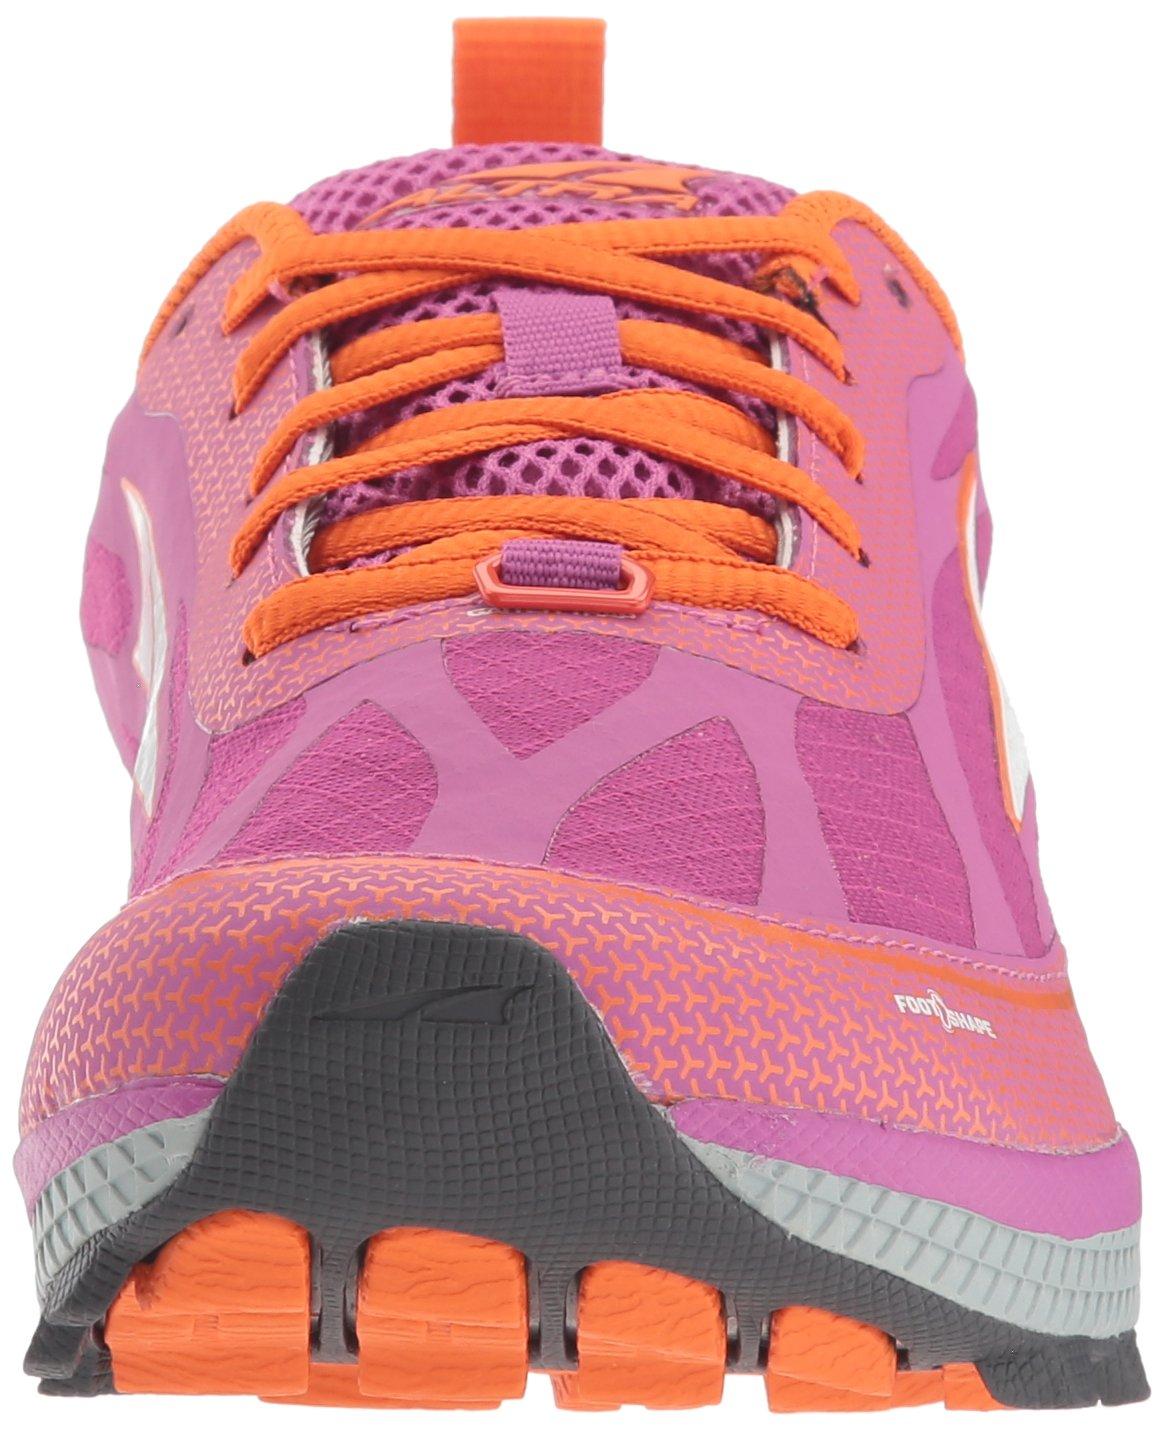 Altra Women's Superior 3.5 B(M) Sneaker B071FRS36C 11 B(M) 3.5 US|Pink 46ca07